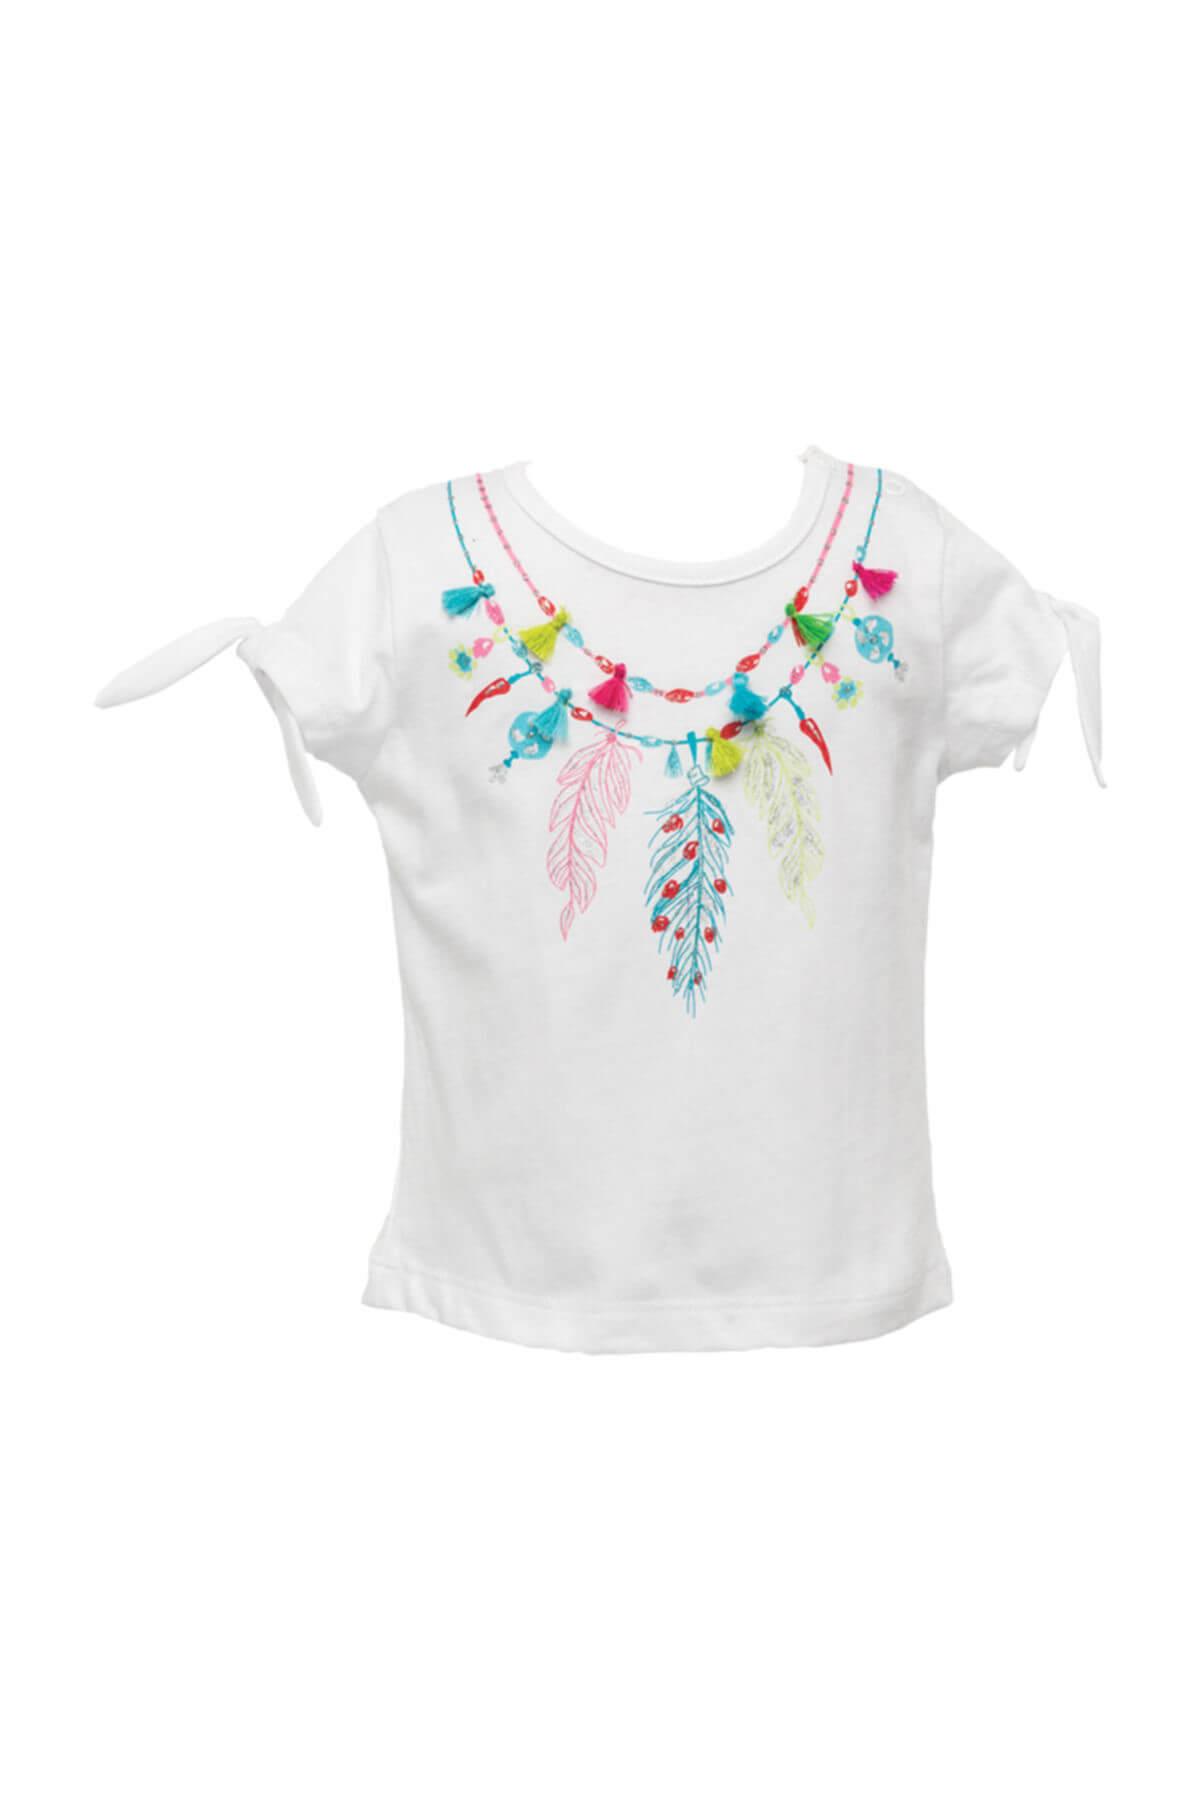 Zeyland Beyaz Kız Bebek T-Shirt 81Z2HNT54 1